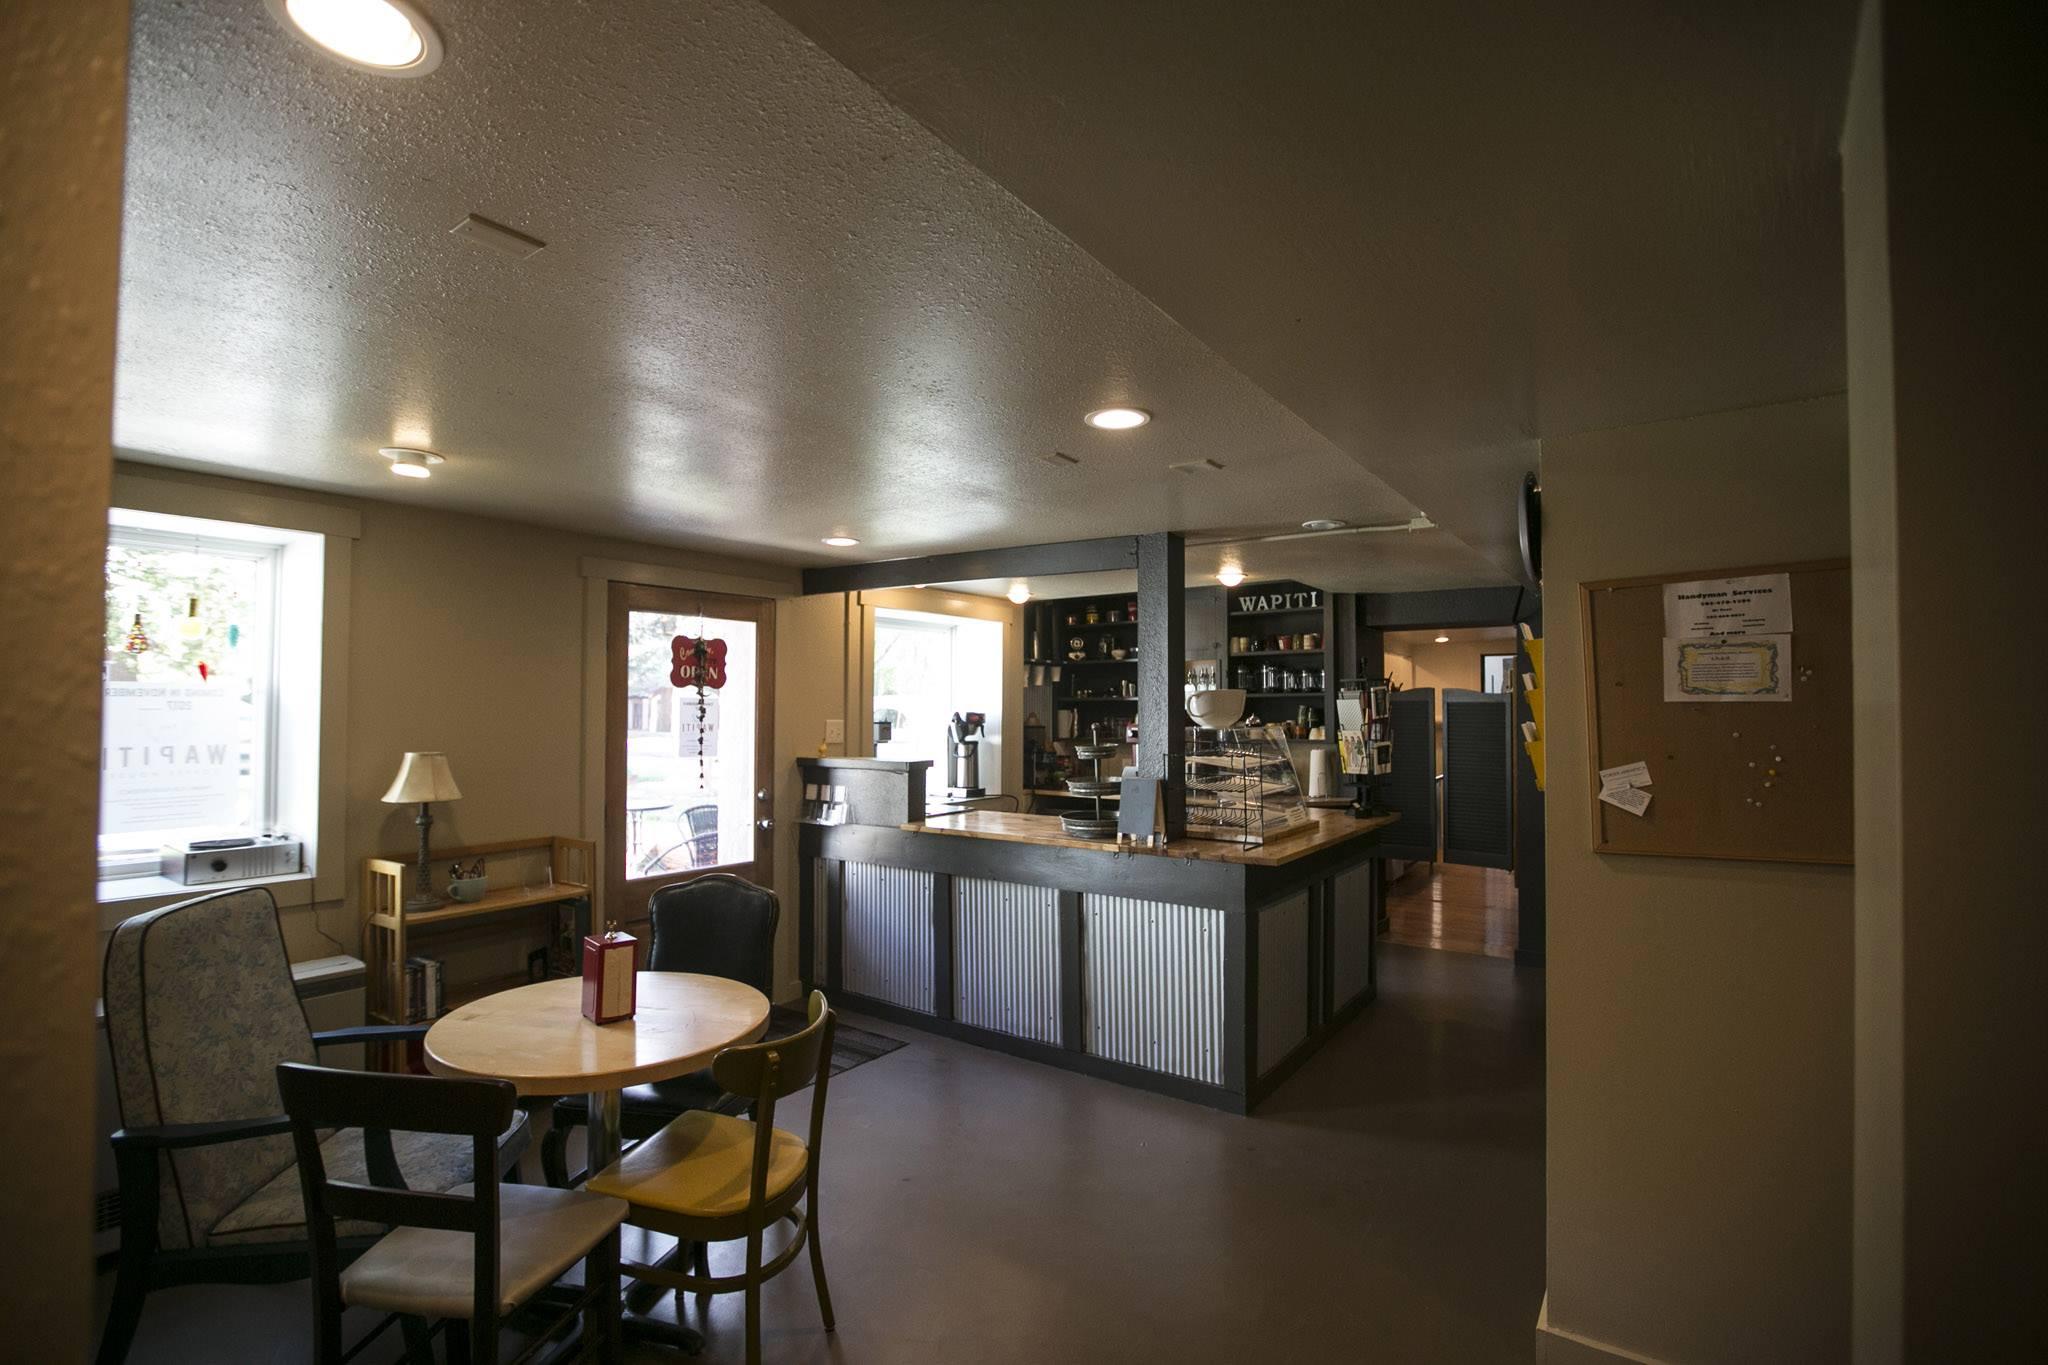 The Wapiti Coffee House